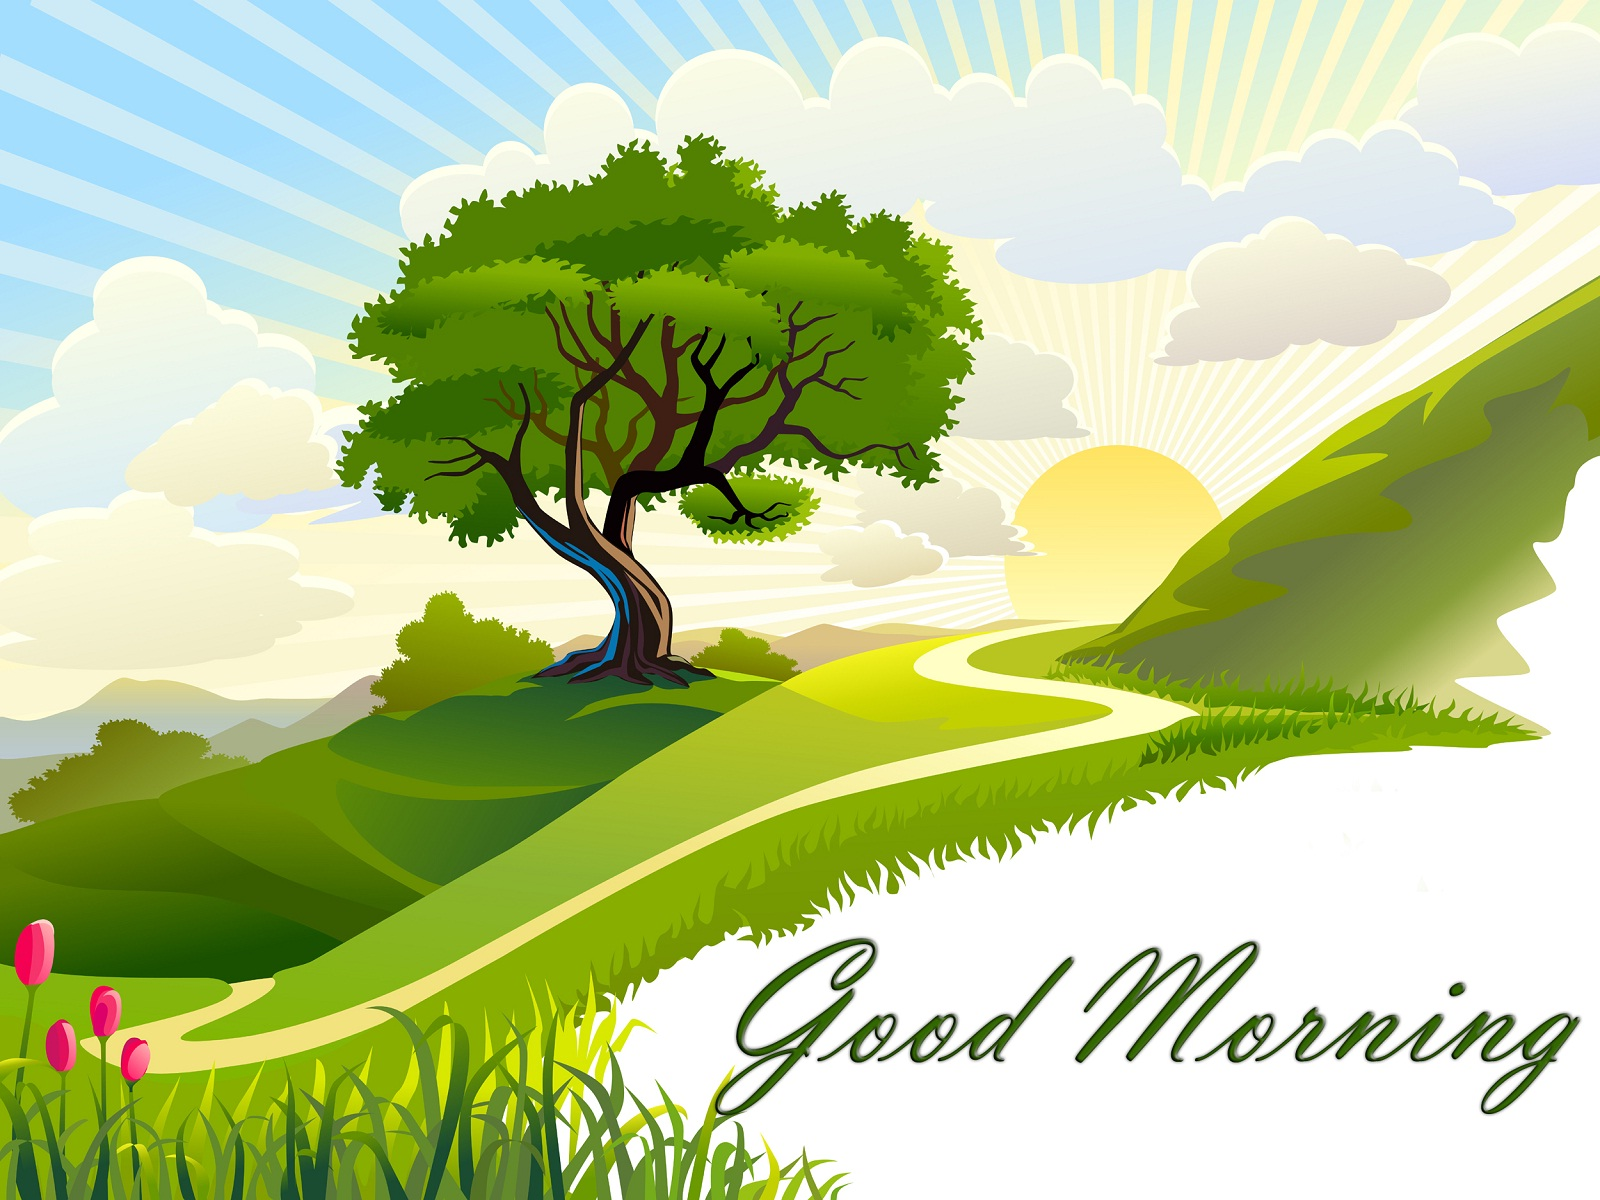 Good Morning Beautiful Wallpaper - WallpaperSafari